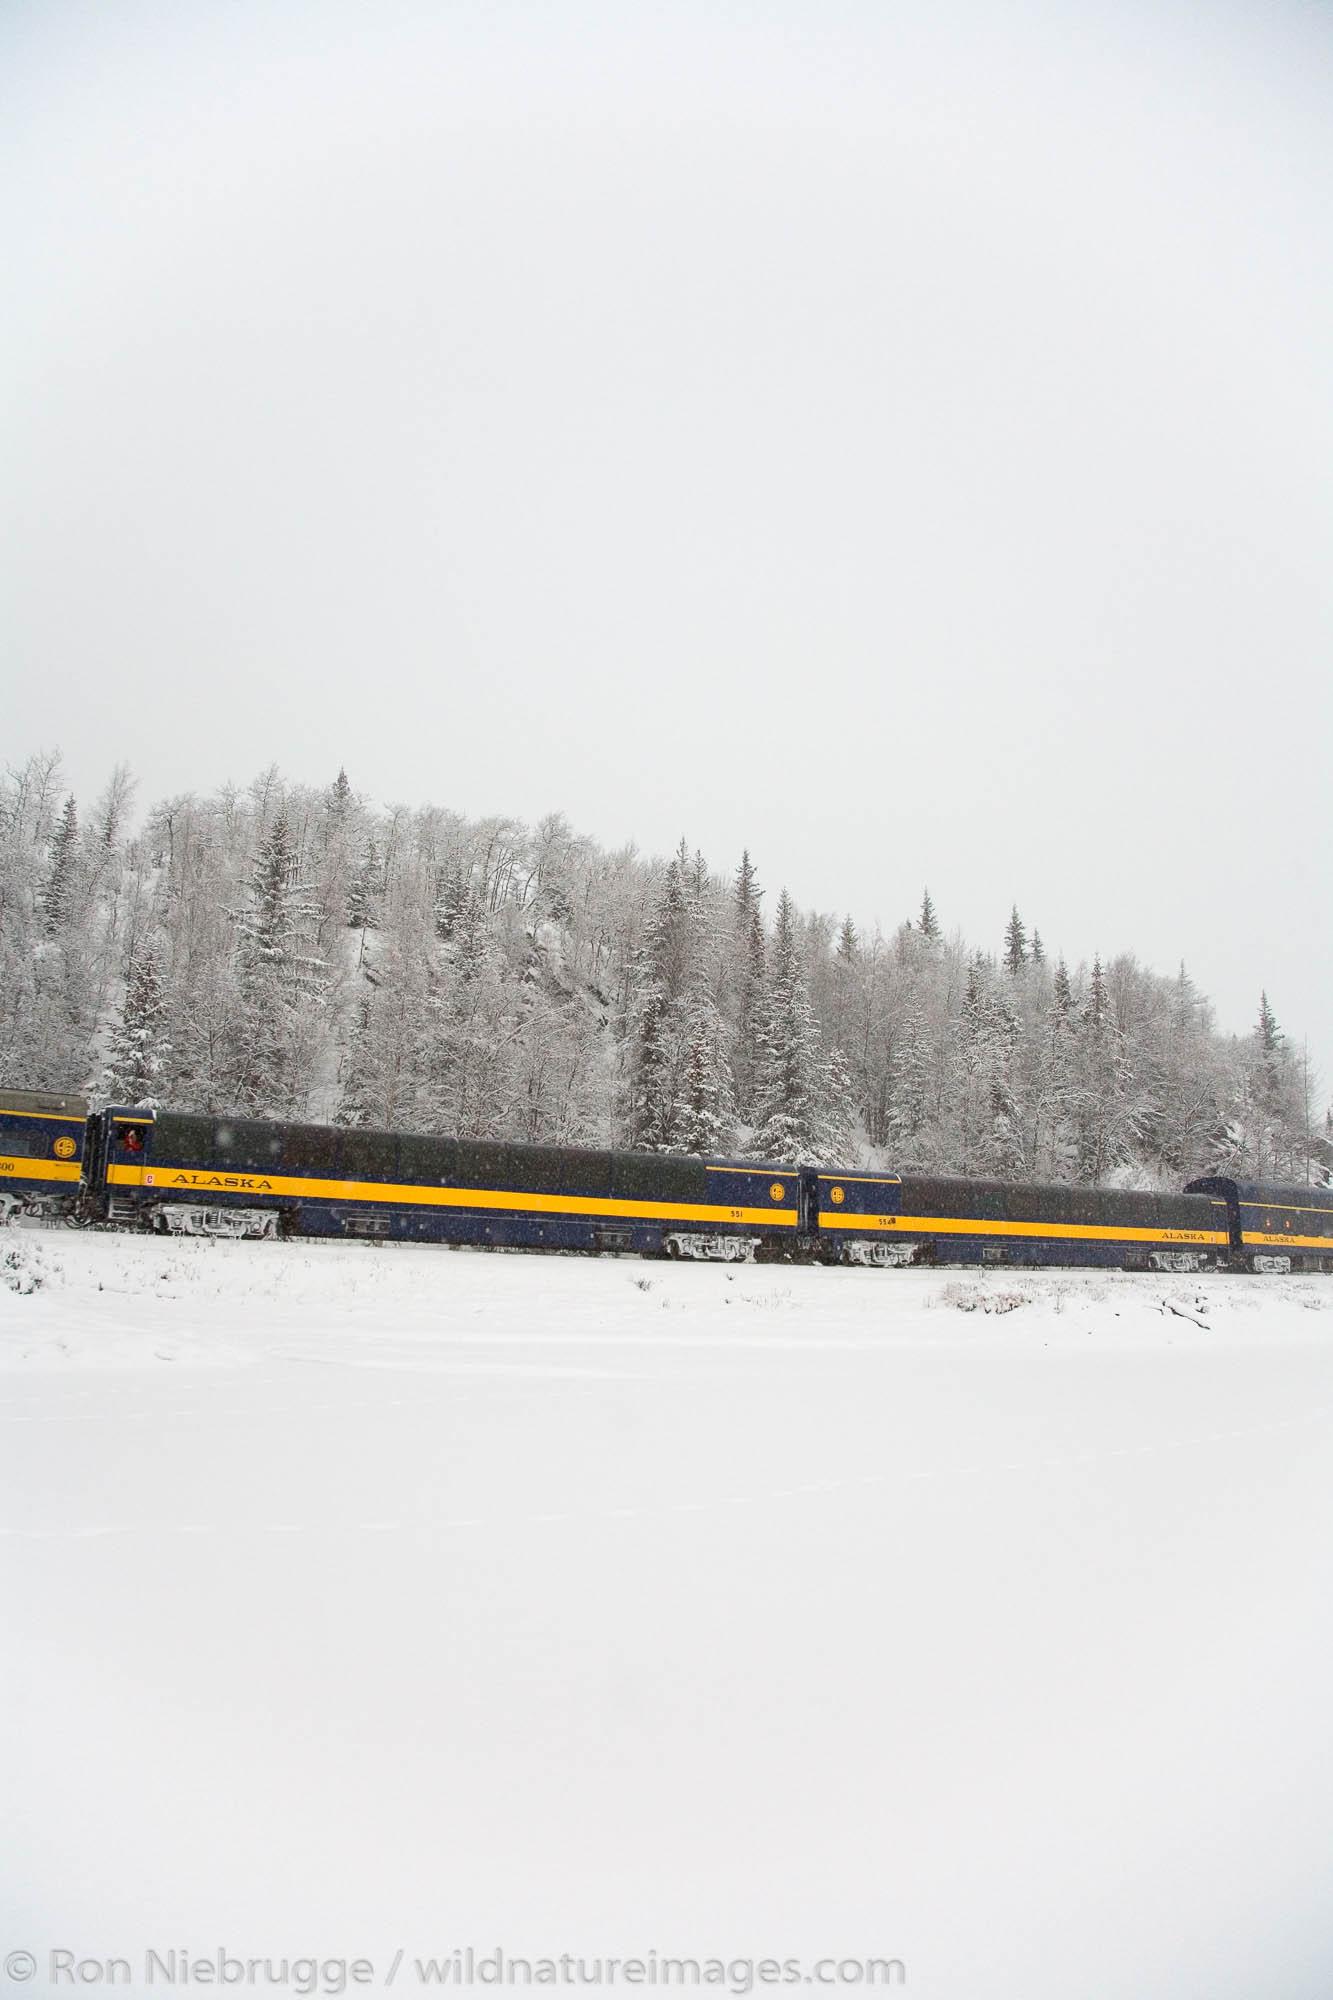 The Alaska Railroad travels along Lower Trail Lake during the winter, Chugach National Forest, Alaska